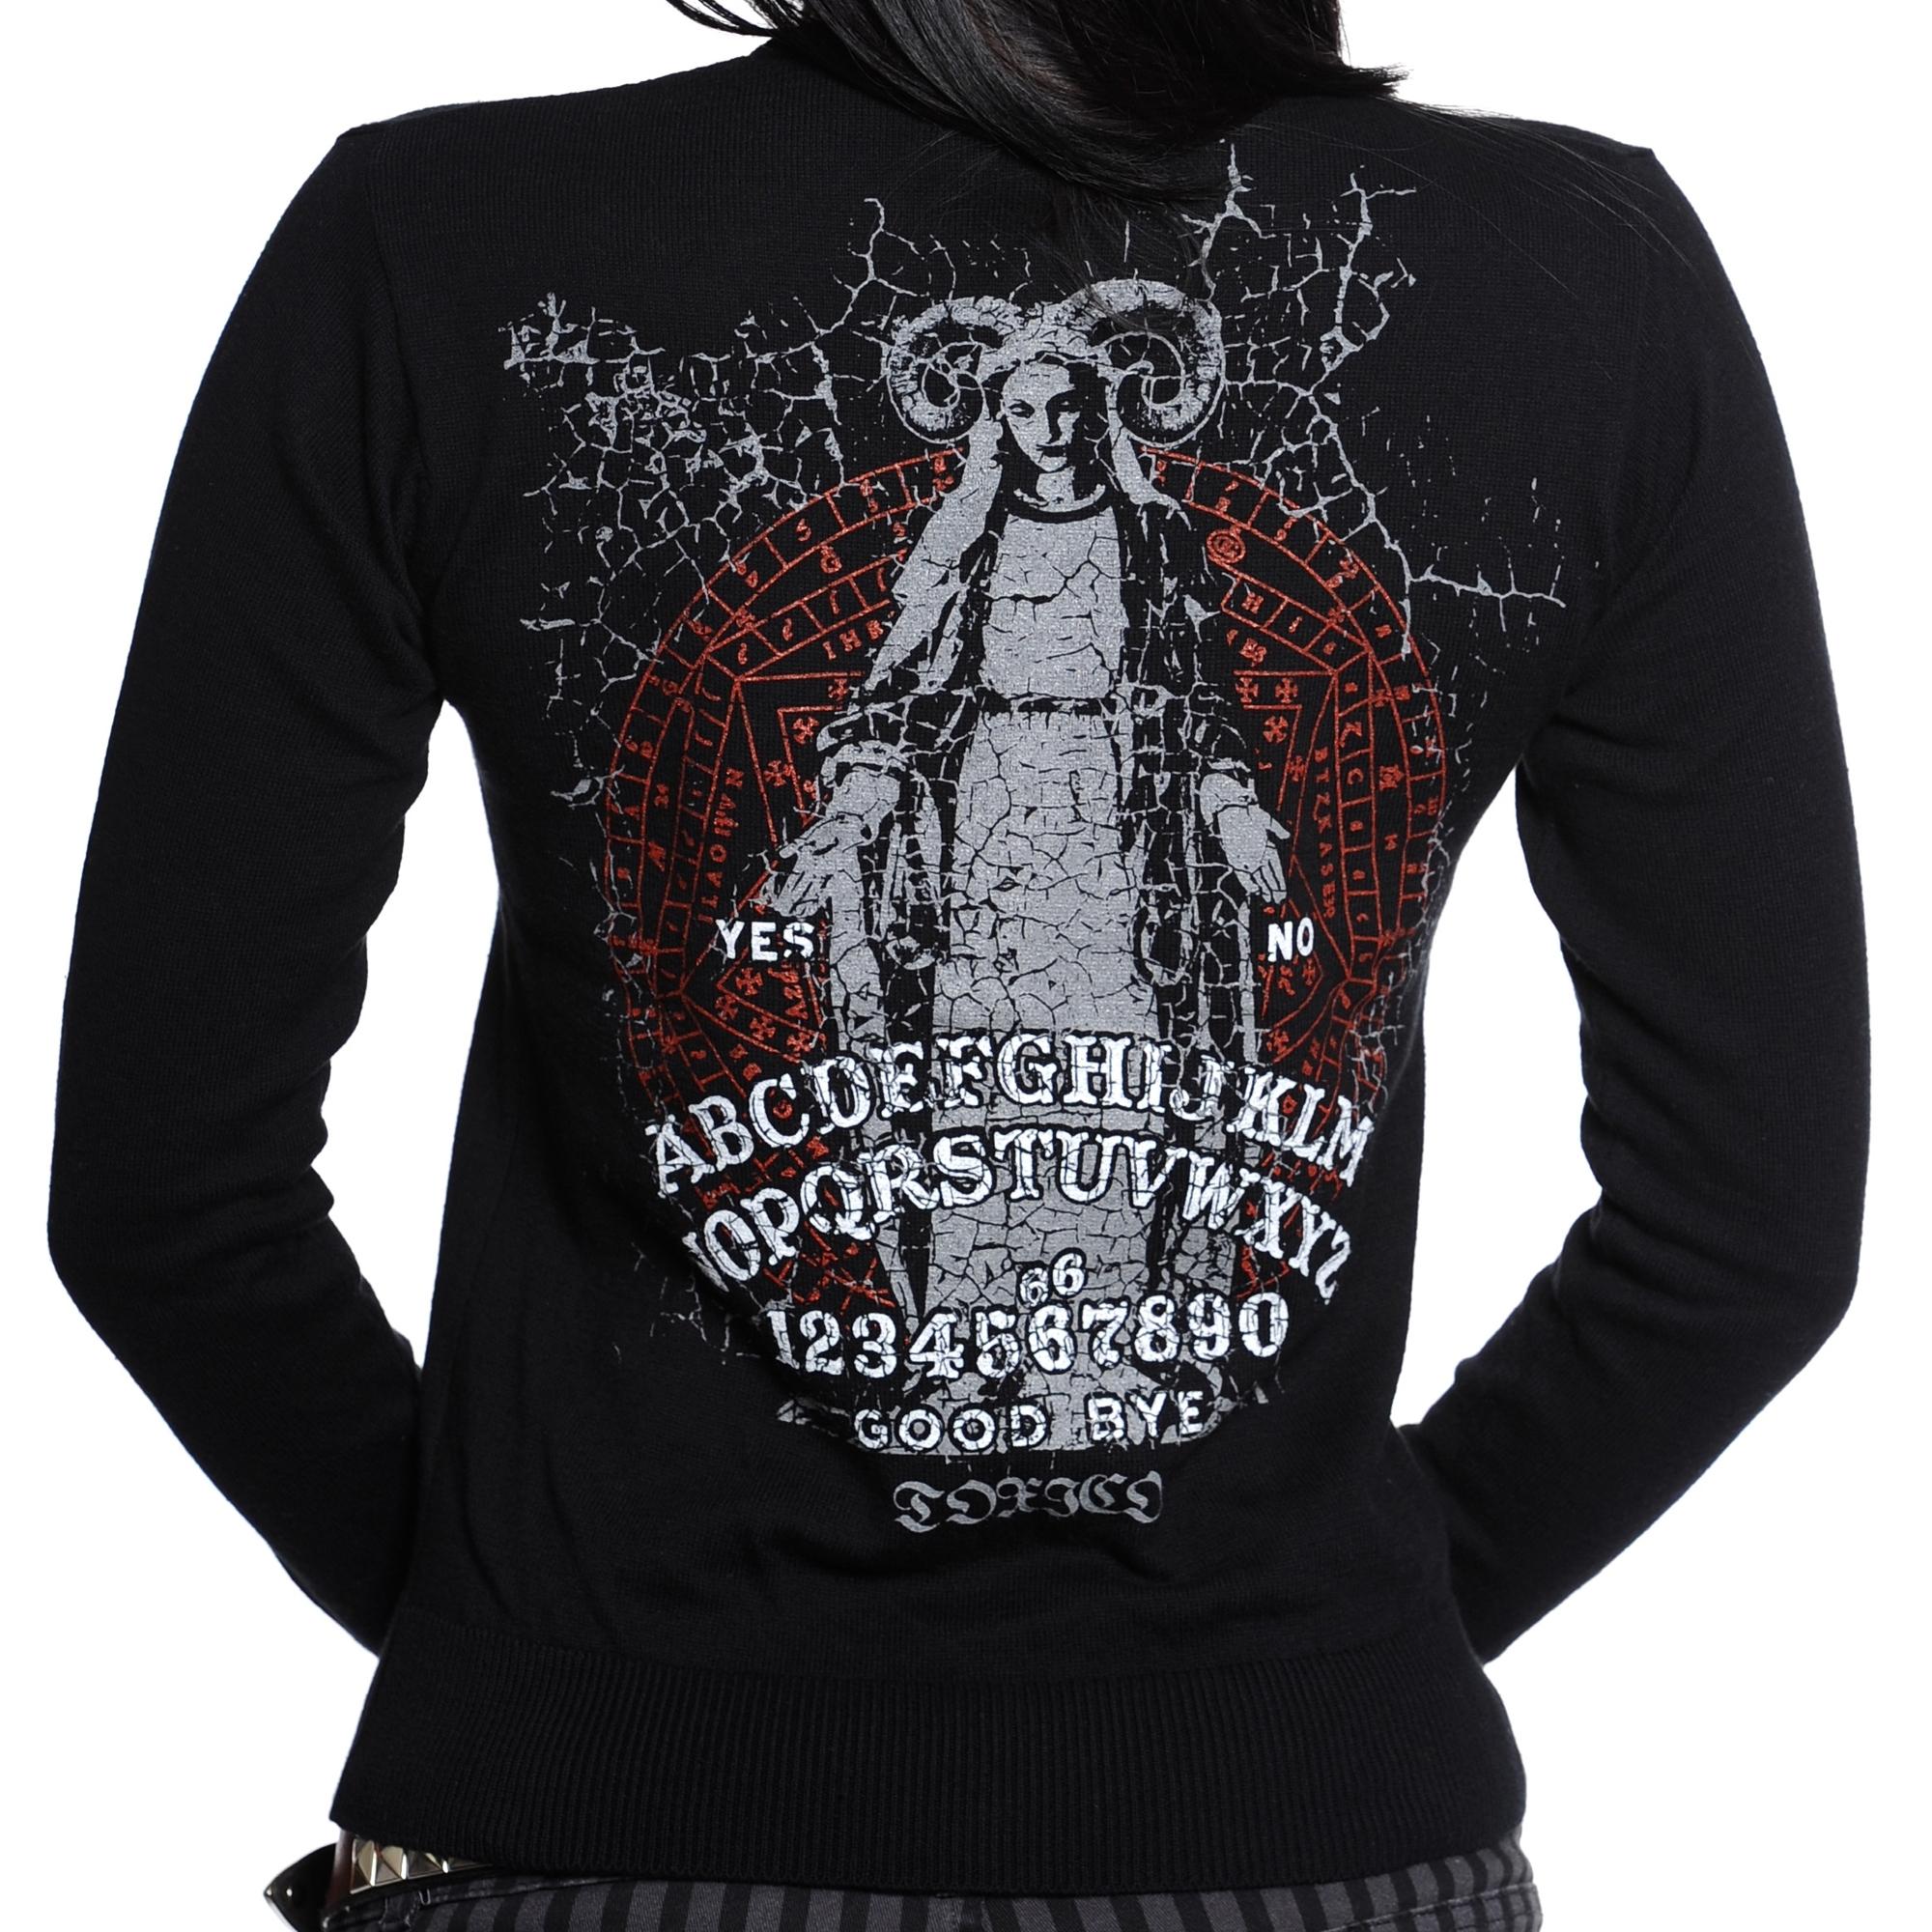 toxico_clothing_womens_ouija_board_tattoo_cardigan_cardigans_and_sweaters_3.jpg